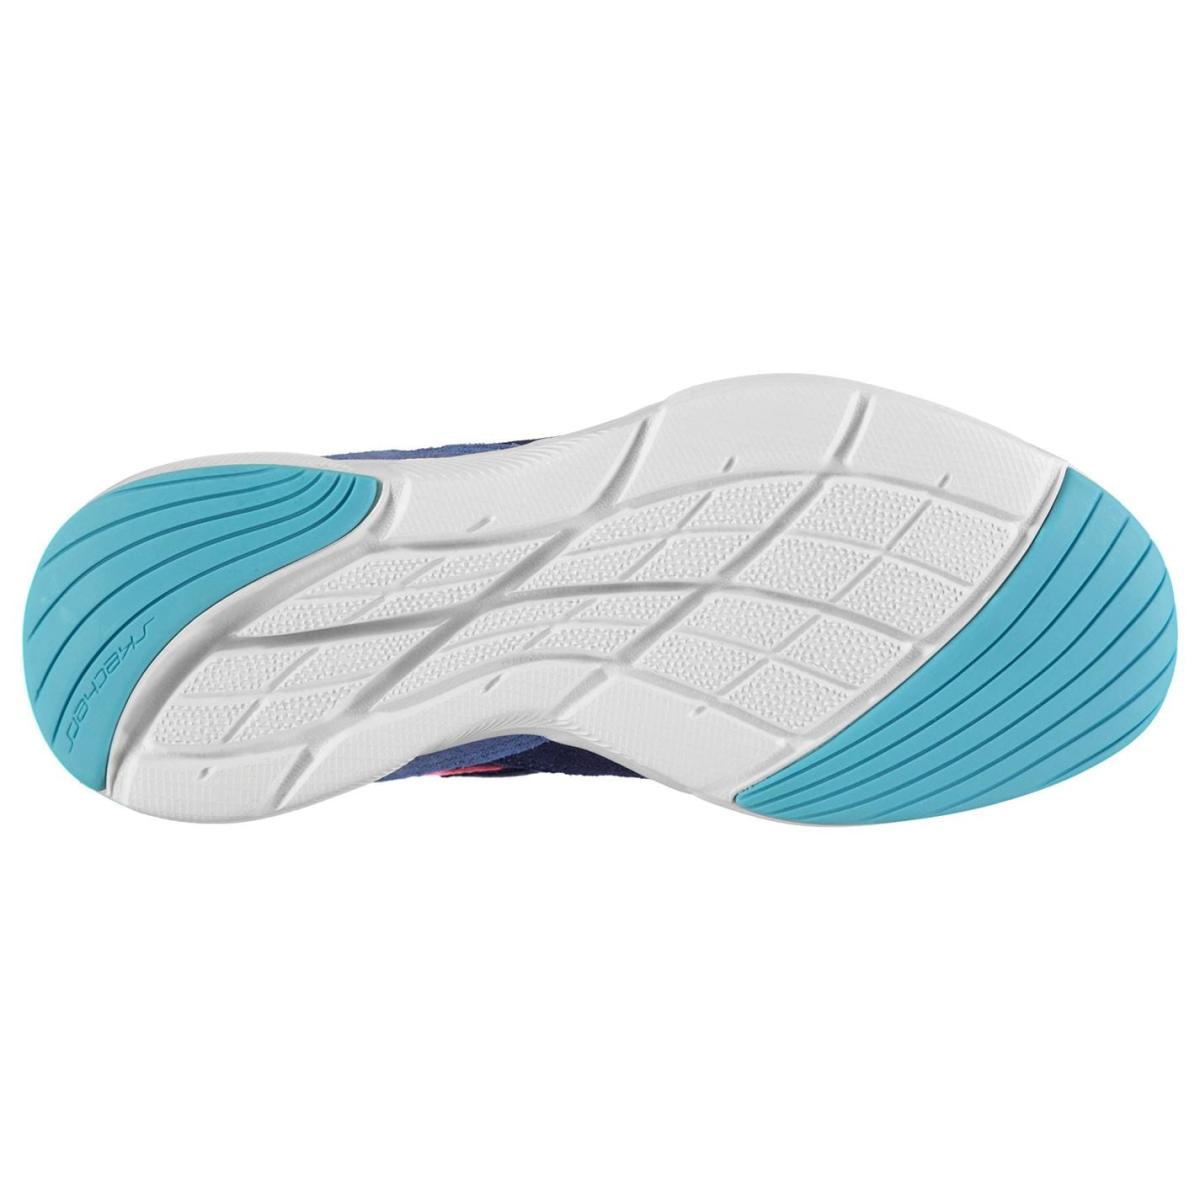 Skechers-Turnschuhe-Damen-Sneaker-Sportschuhe-Laufschuhe-Meridian-1121 Indexbild 3